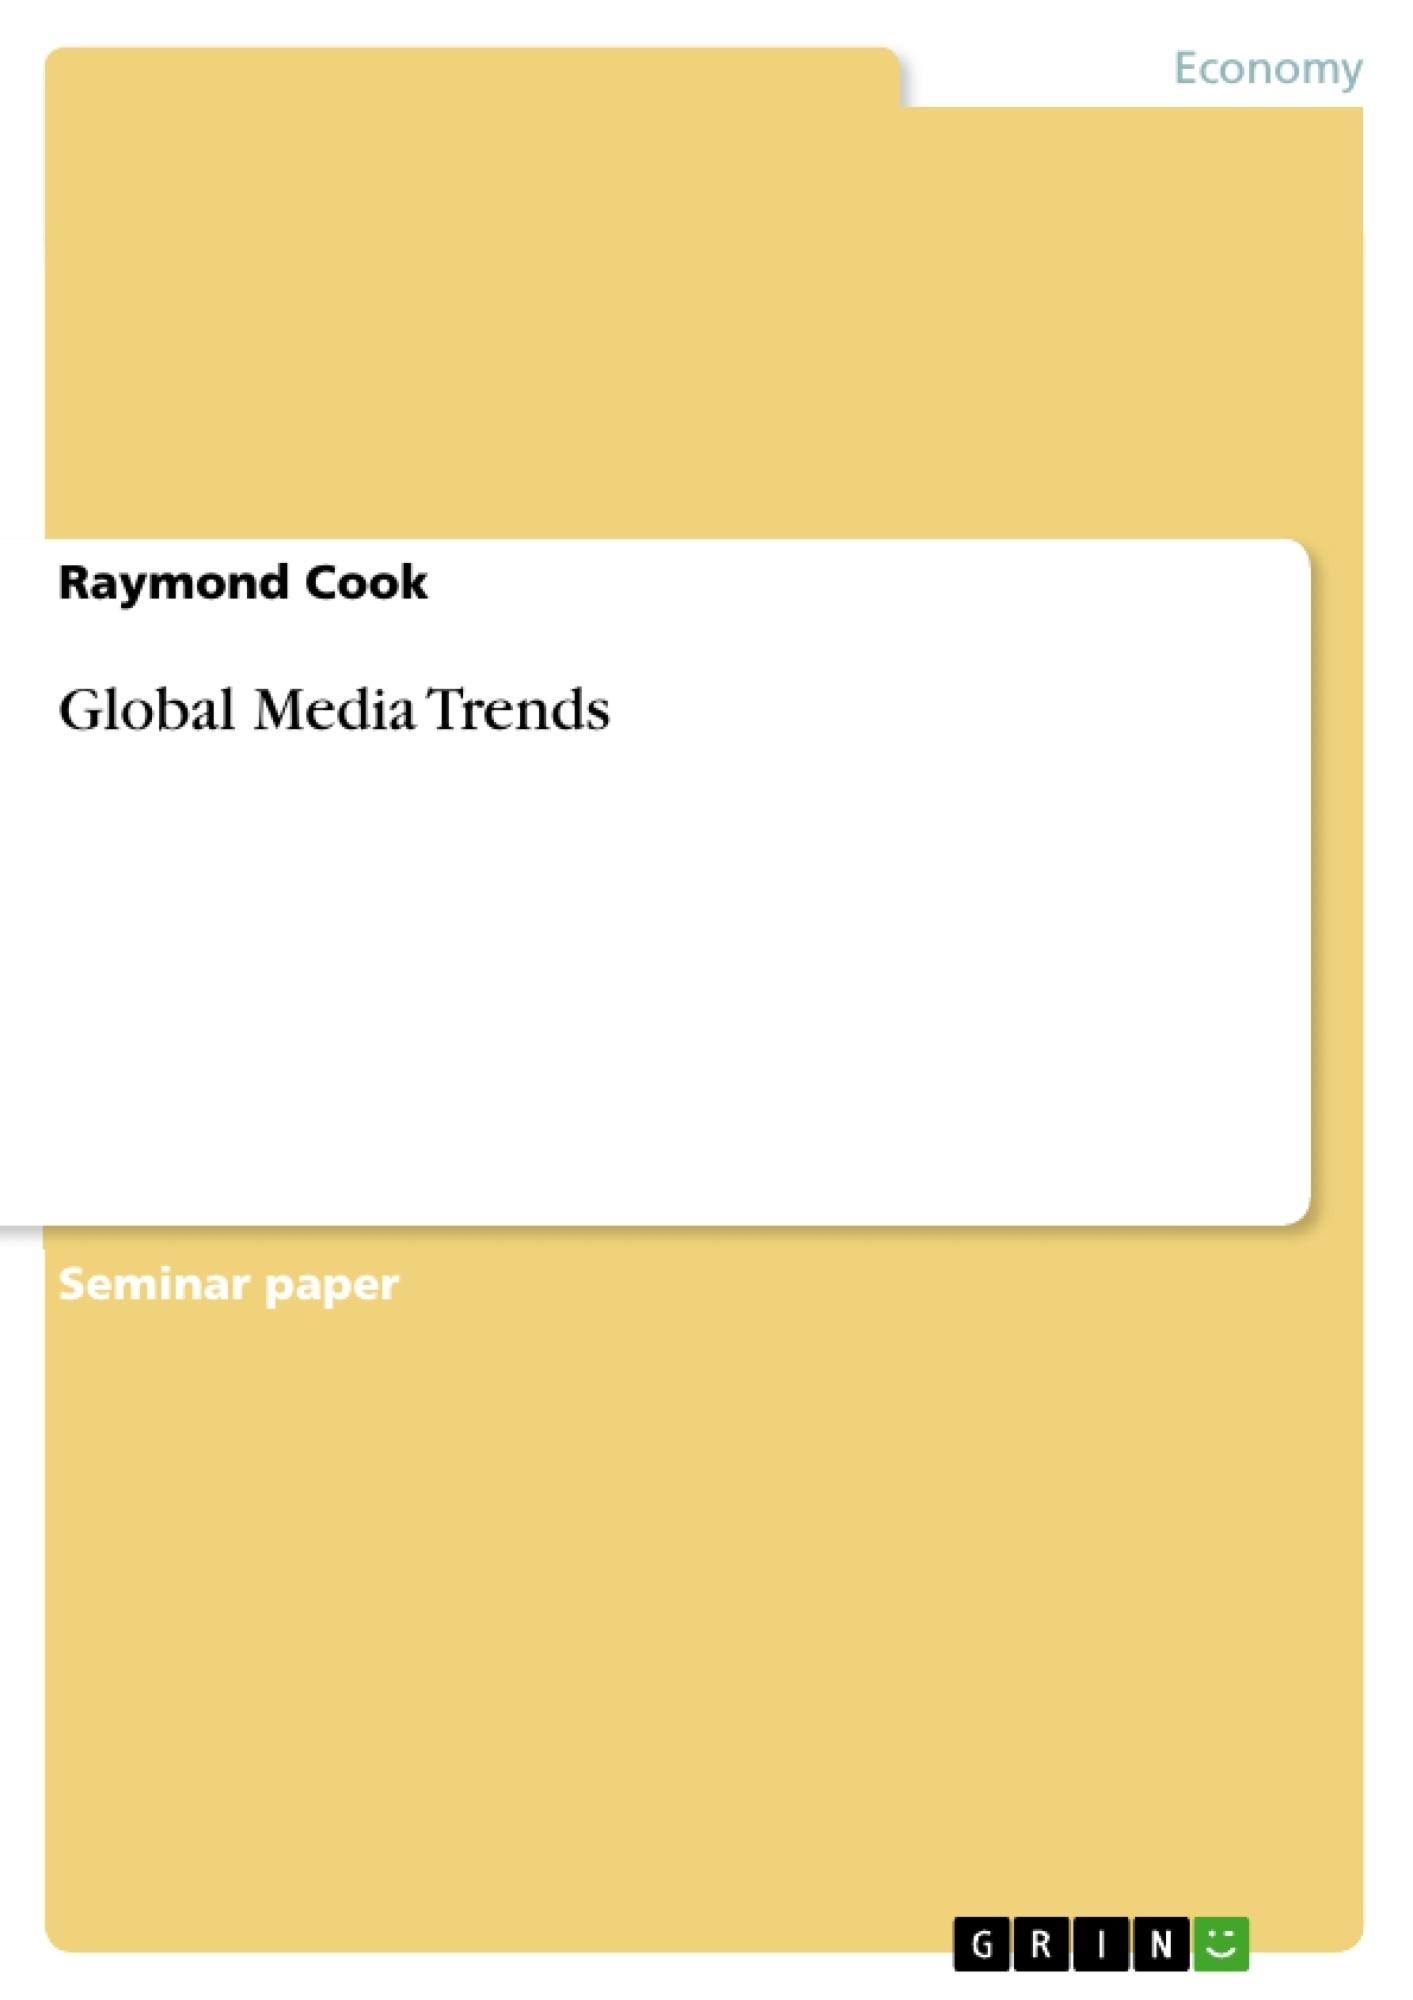 Title: Global Media Trends